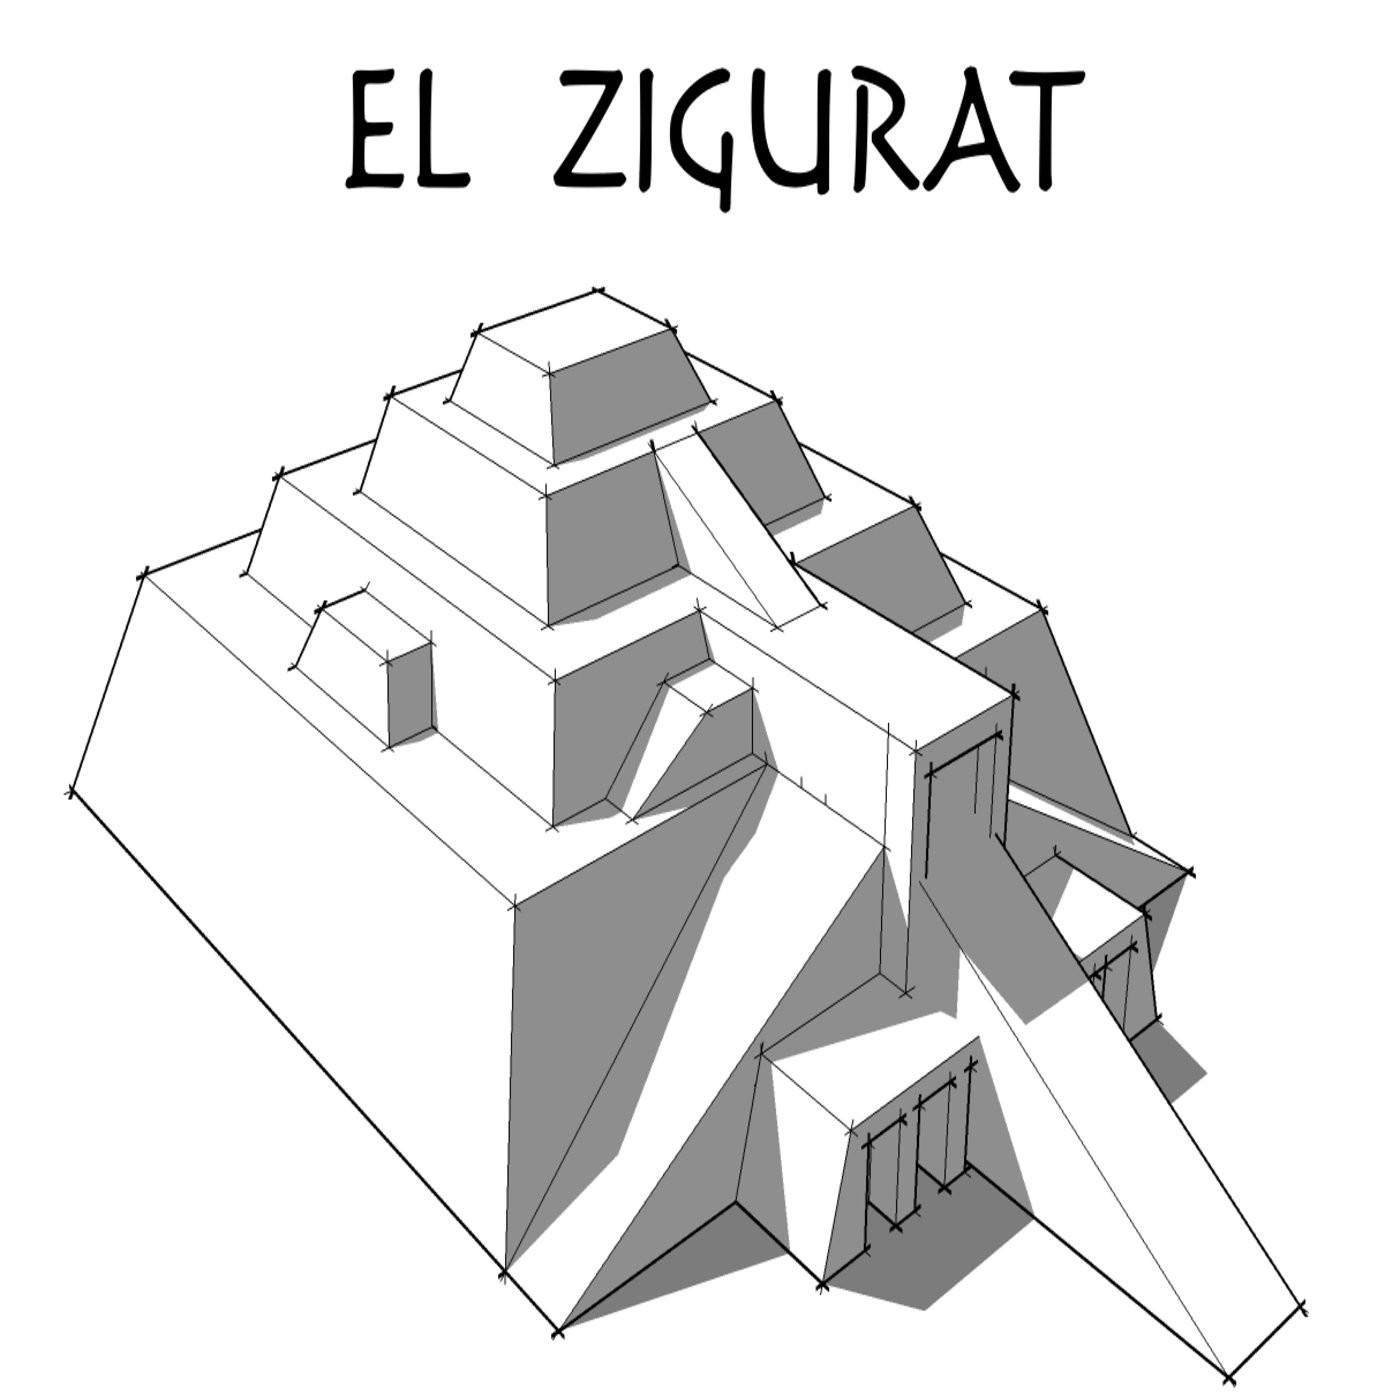 El zigurat